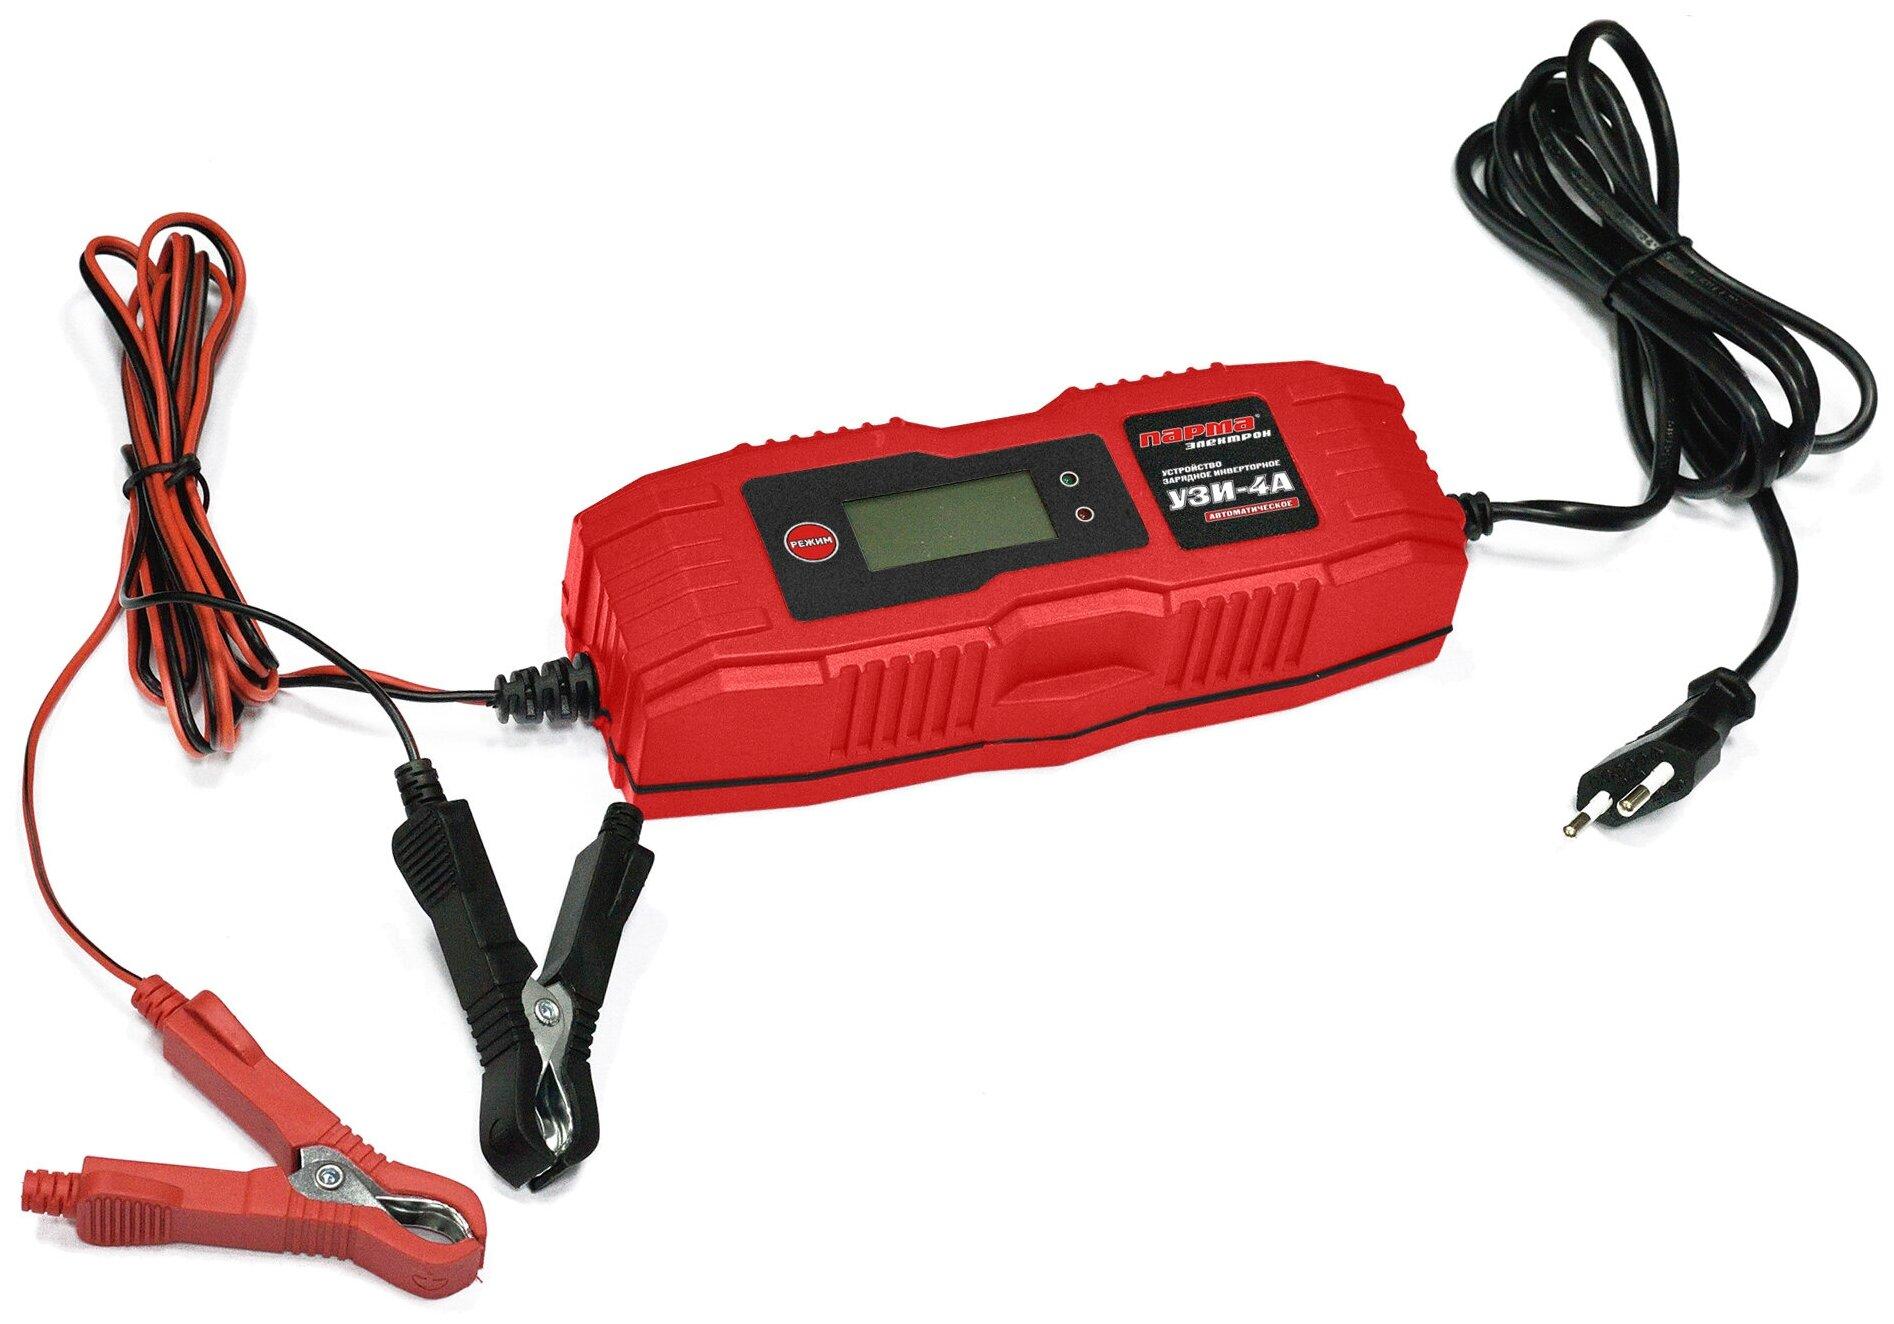 Зарядное устройство Парма УЗИ-4А